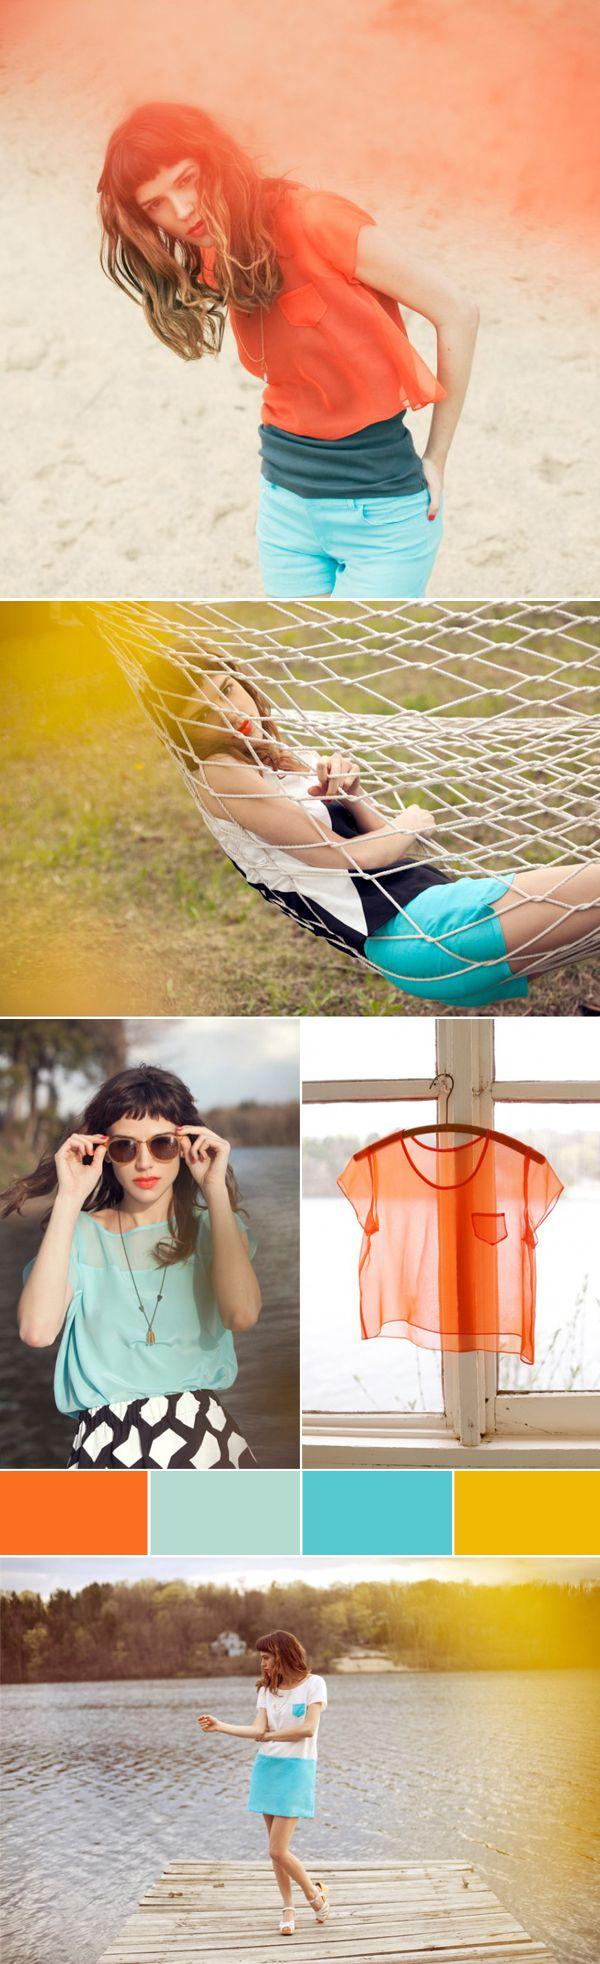 summer brightsColors Combos, Kitchens Colors, Bedrooms Colors, Colors Palettes, Colors Schemes, House Colors, Summer Colors, Kitchens Colours, White Cabinets